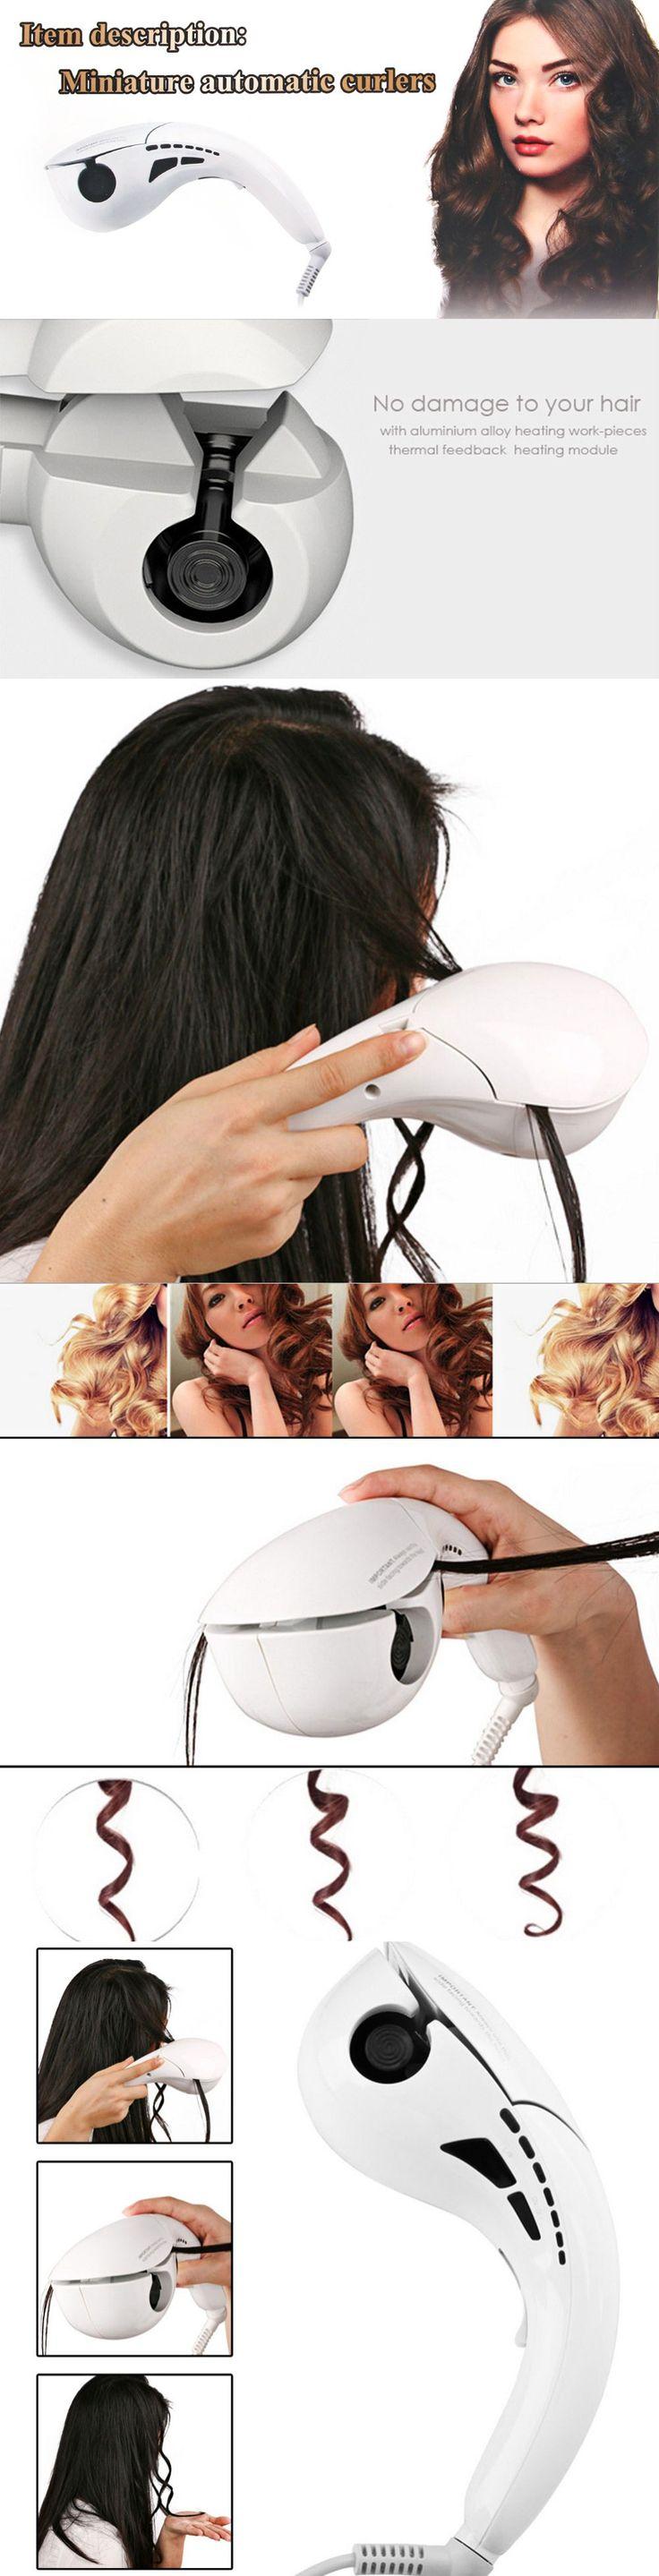 JL - 608PRO - B Automatic Hair Curler - US PLUG WHITE